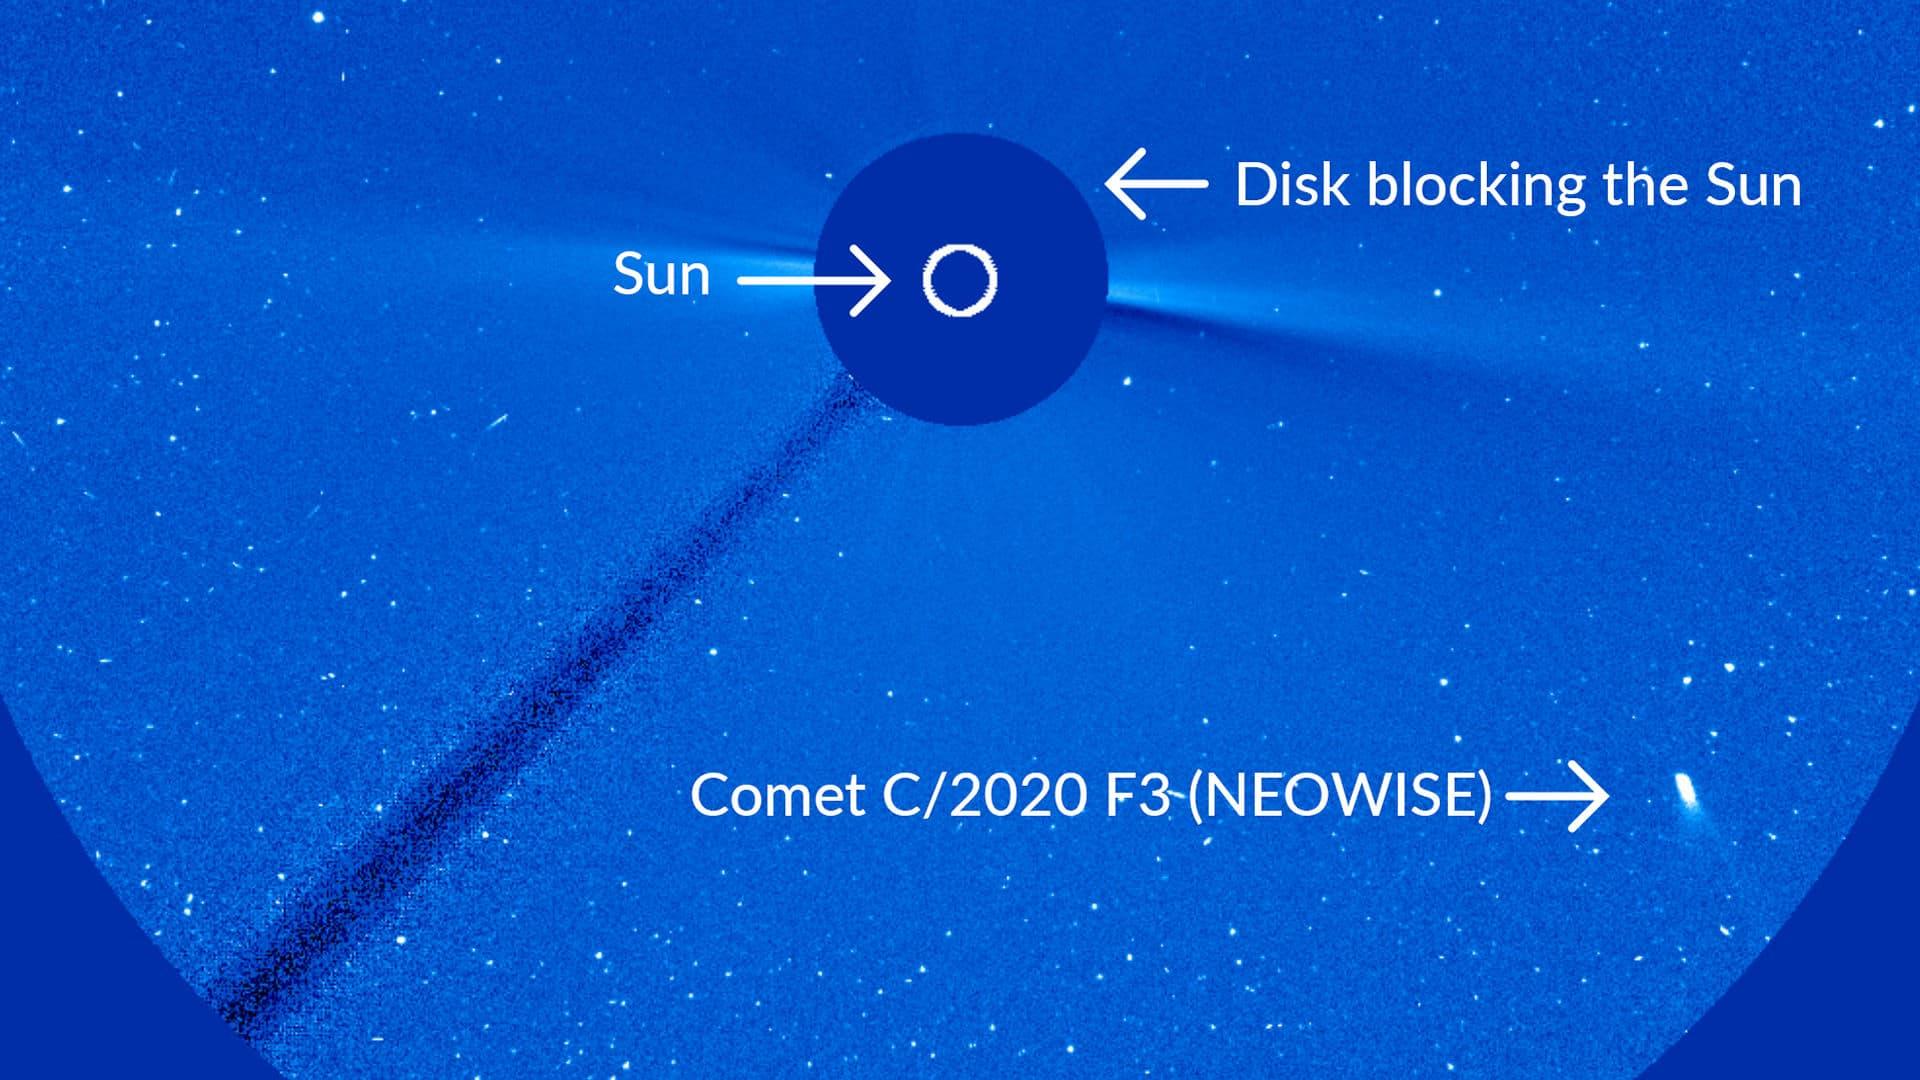 NEOWISE(C/2020 F3)彗星能在近日点幸存下来吗?